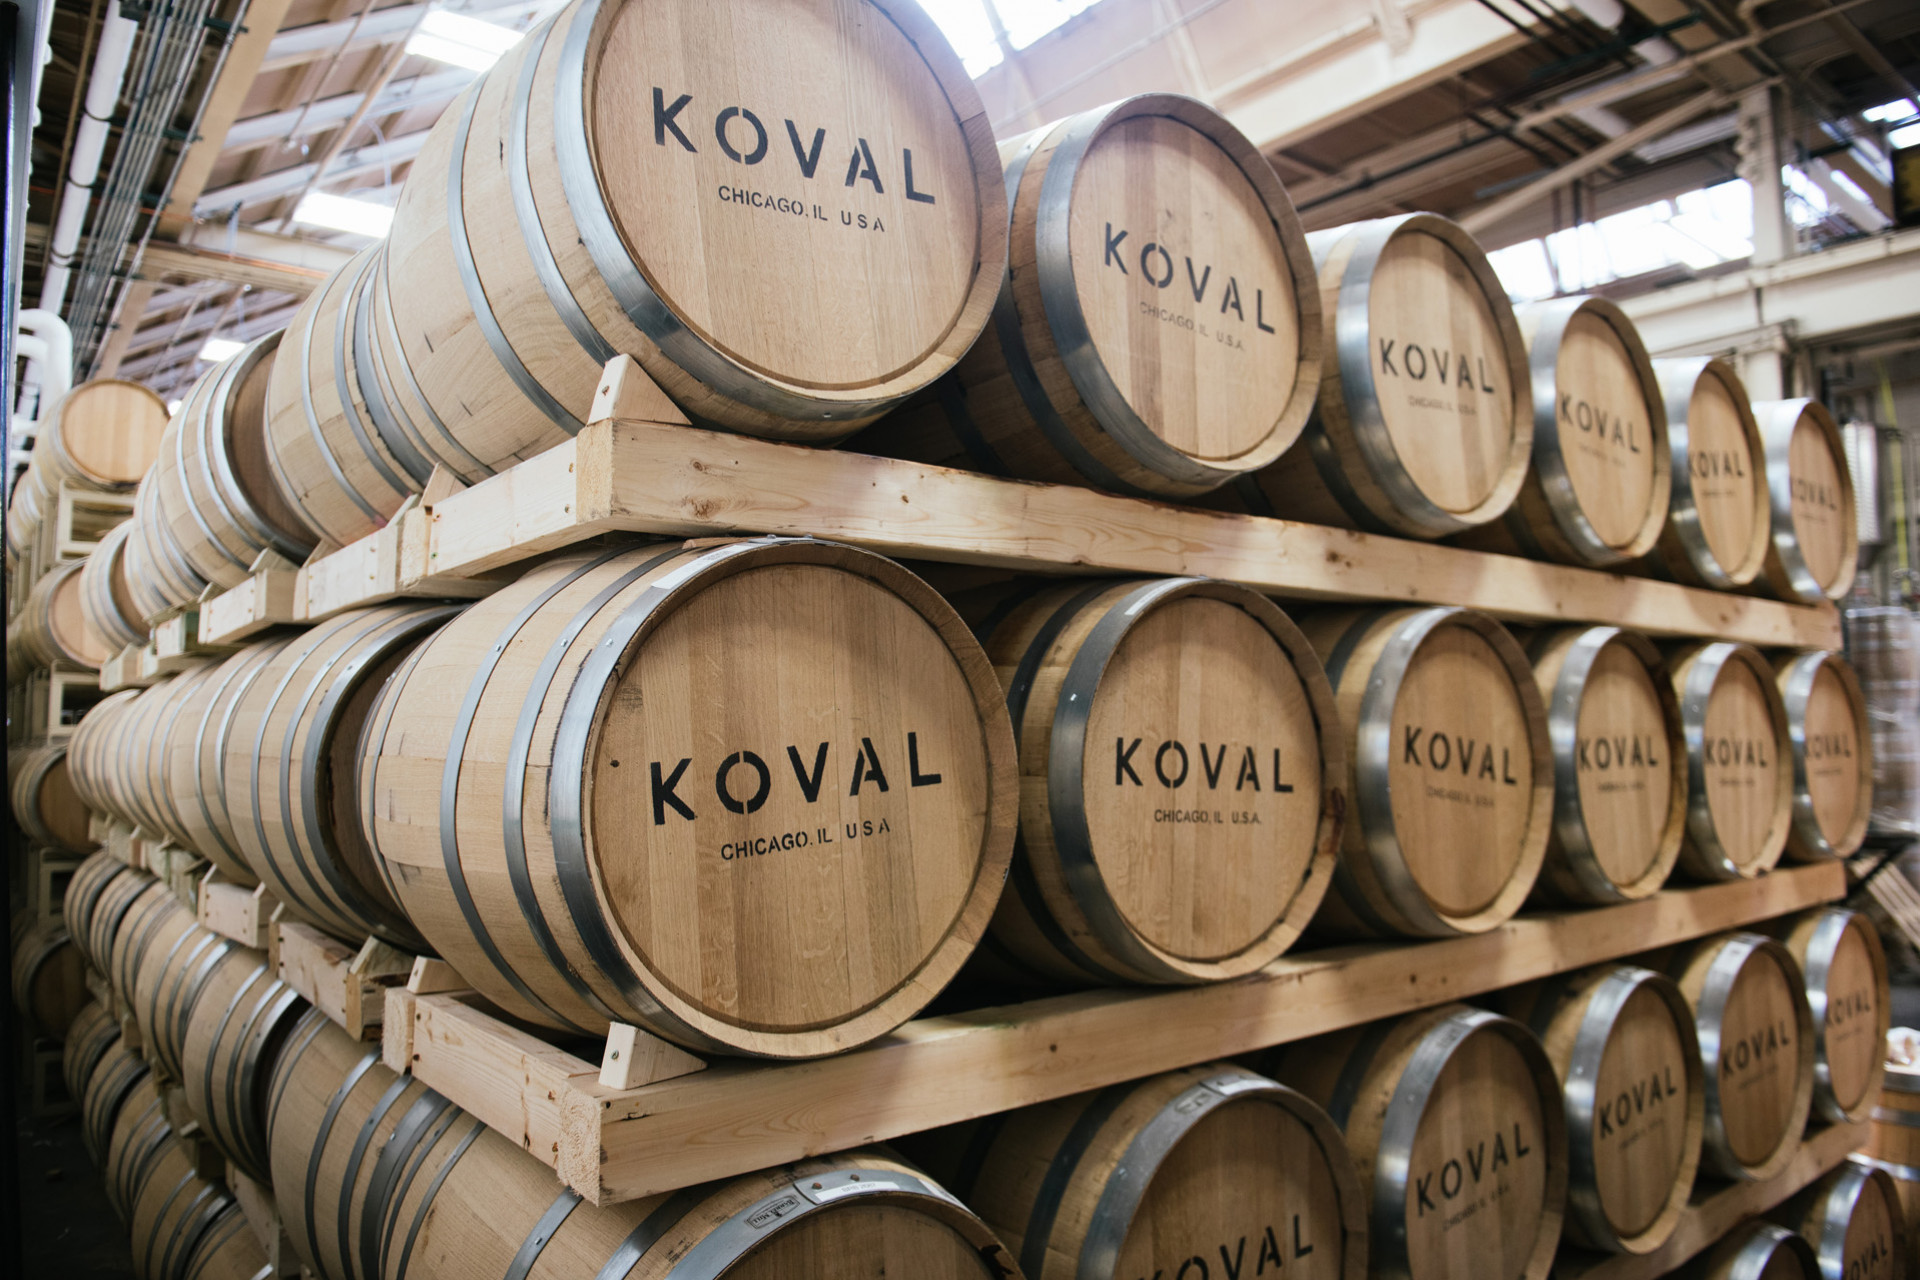 Koval whisky